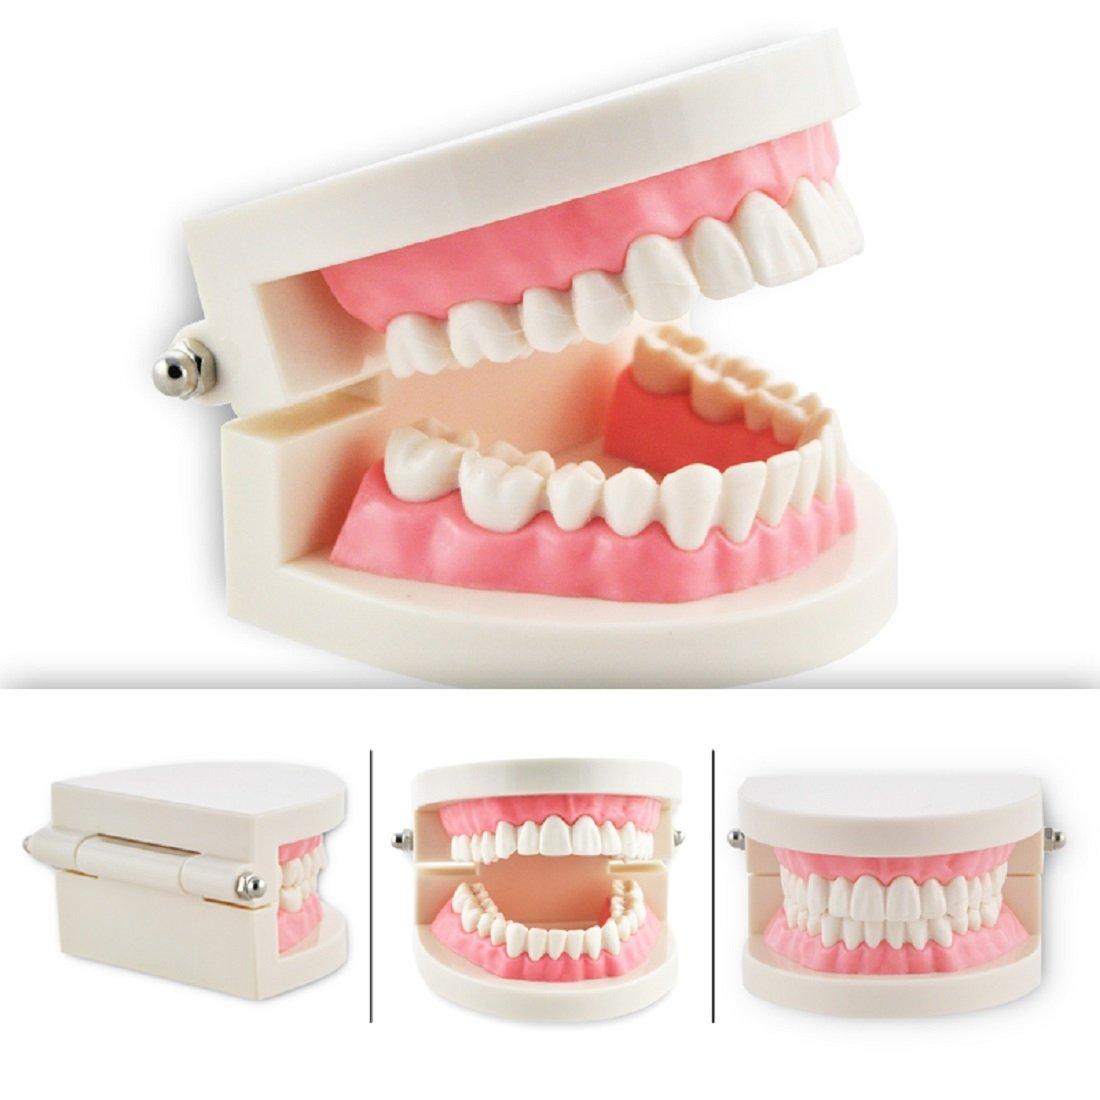 Tinsay 1 Piece Dental Dentist Flesh Pink Gums Standard Teeth Model Tooth Teaching Model